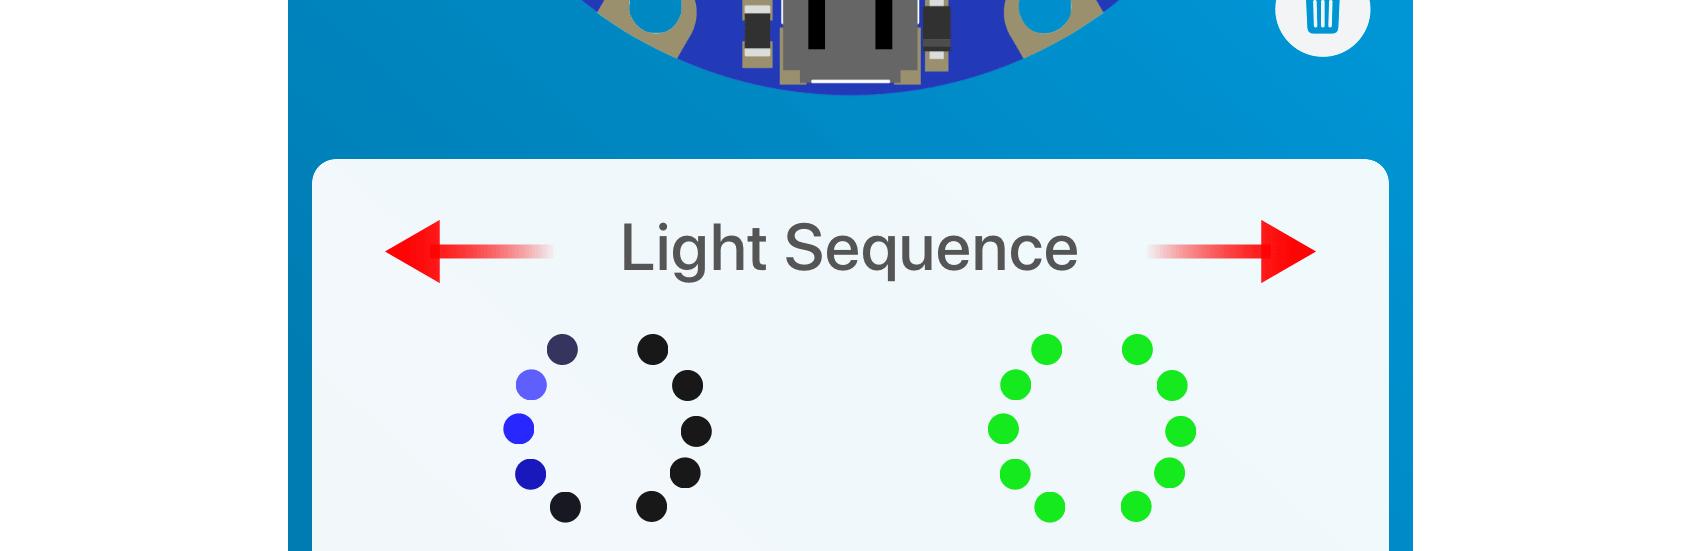 sensors_neopixels-swipe.png